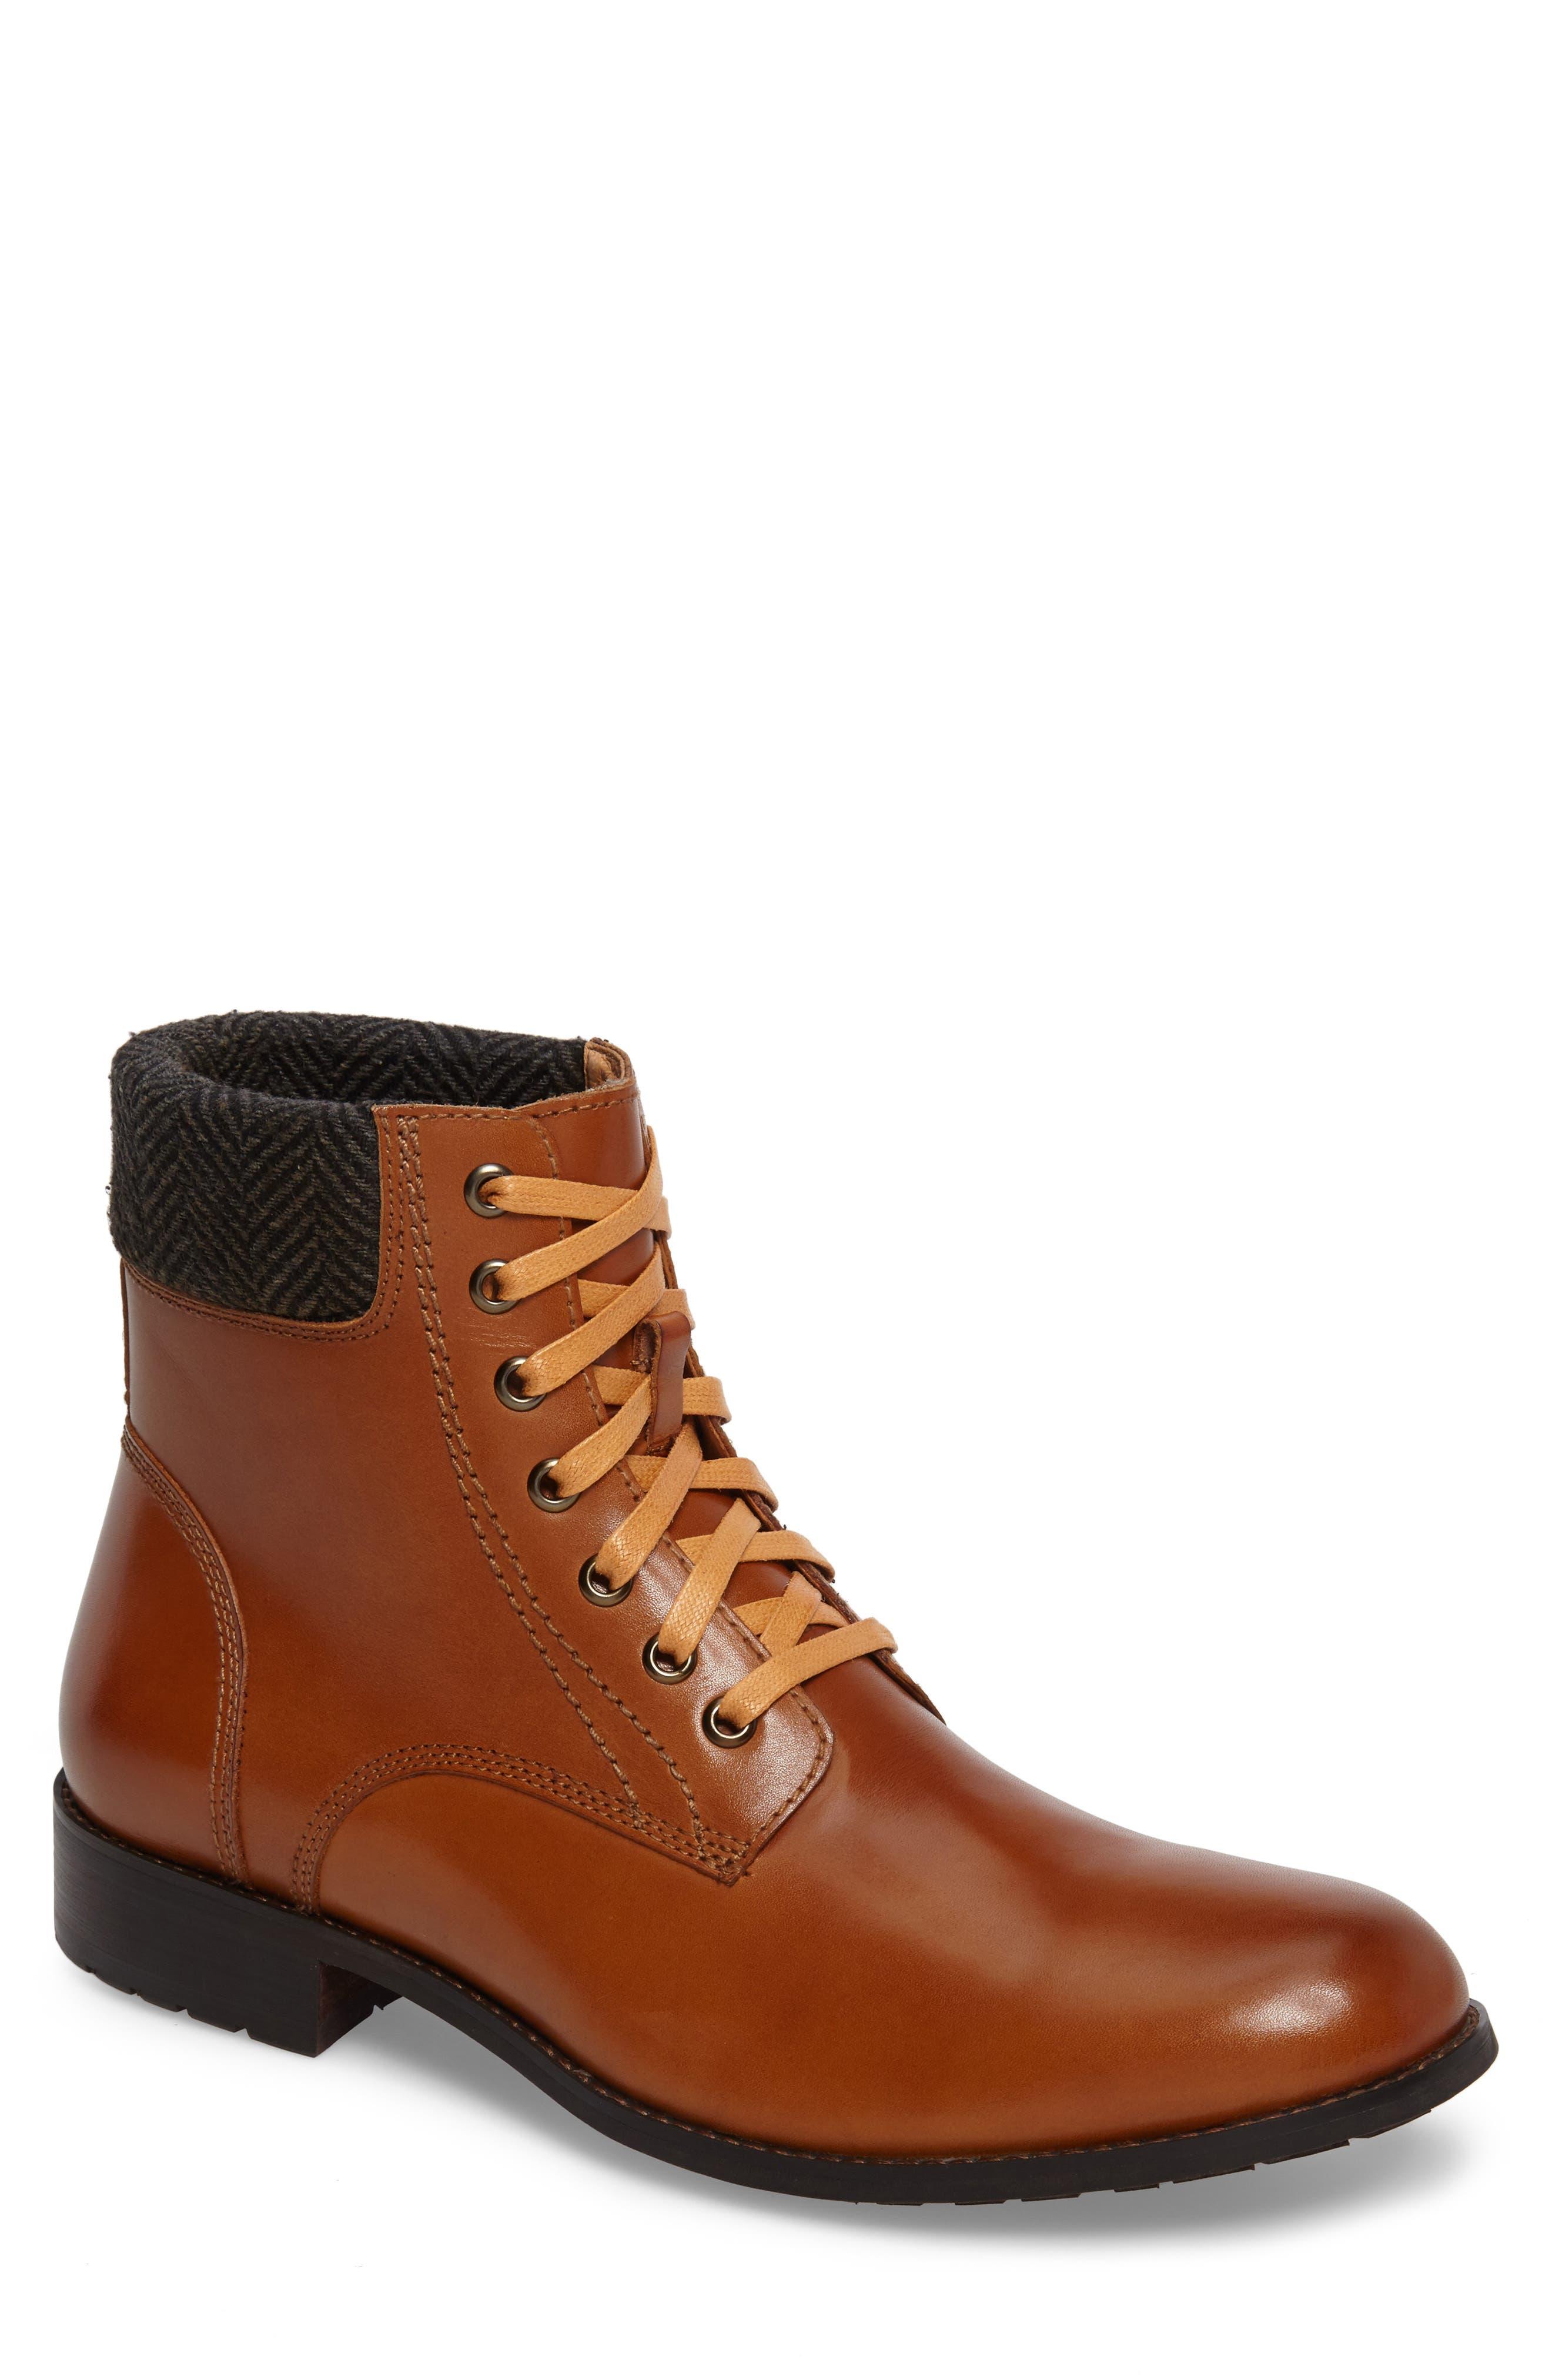 Saar Plain Toe Boot,                         Main,                         color, Cognac Leather